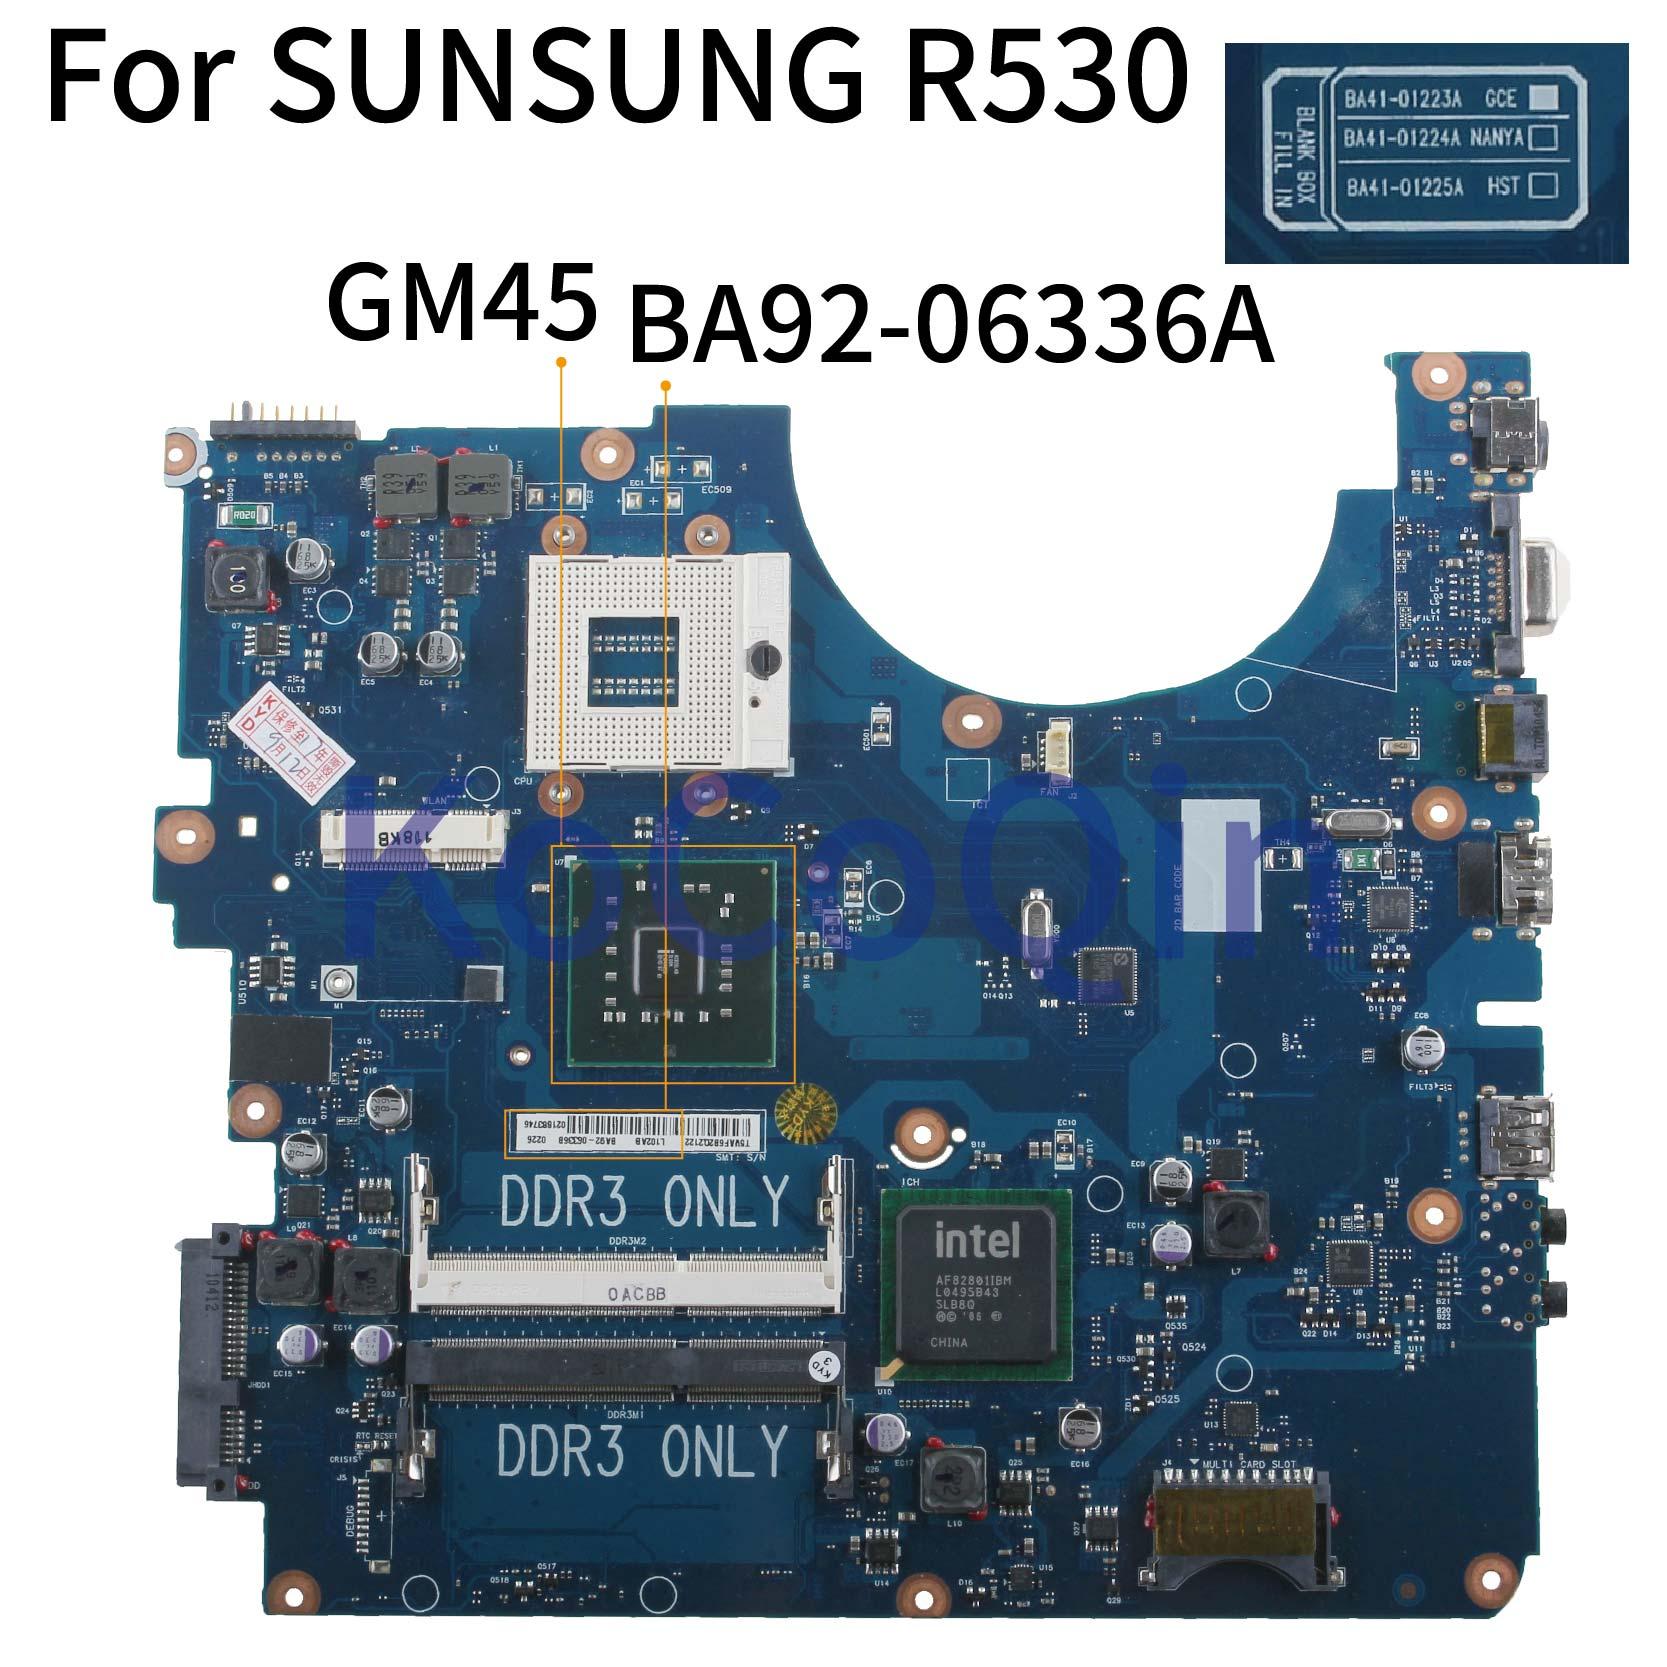 Kocoqin placa-mãe do portátil para sunsung NP-R530 r530 mainboard BA41-01223A BA92-06336A gm45